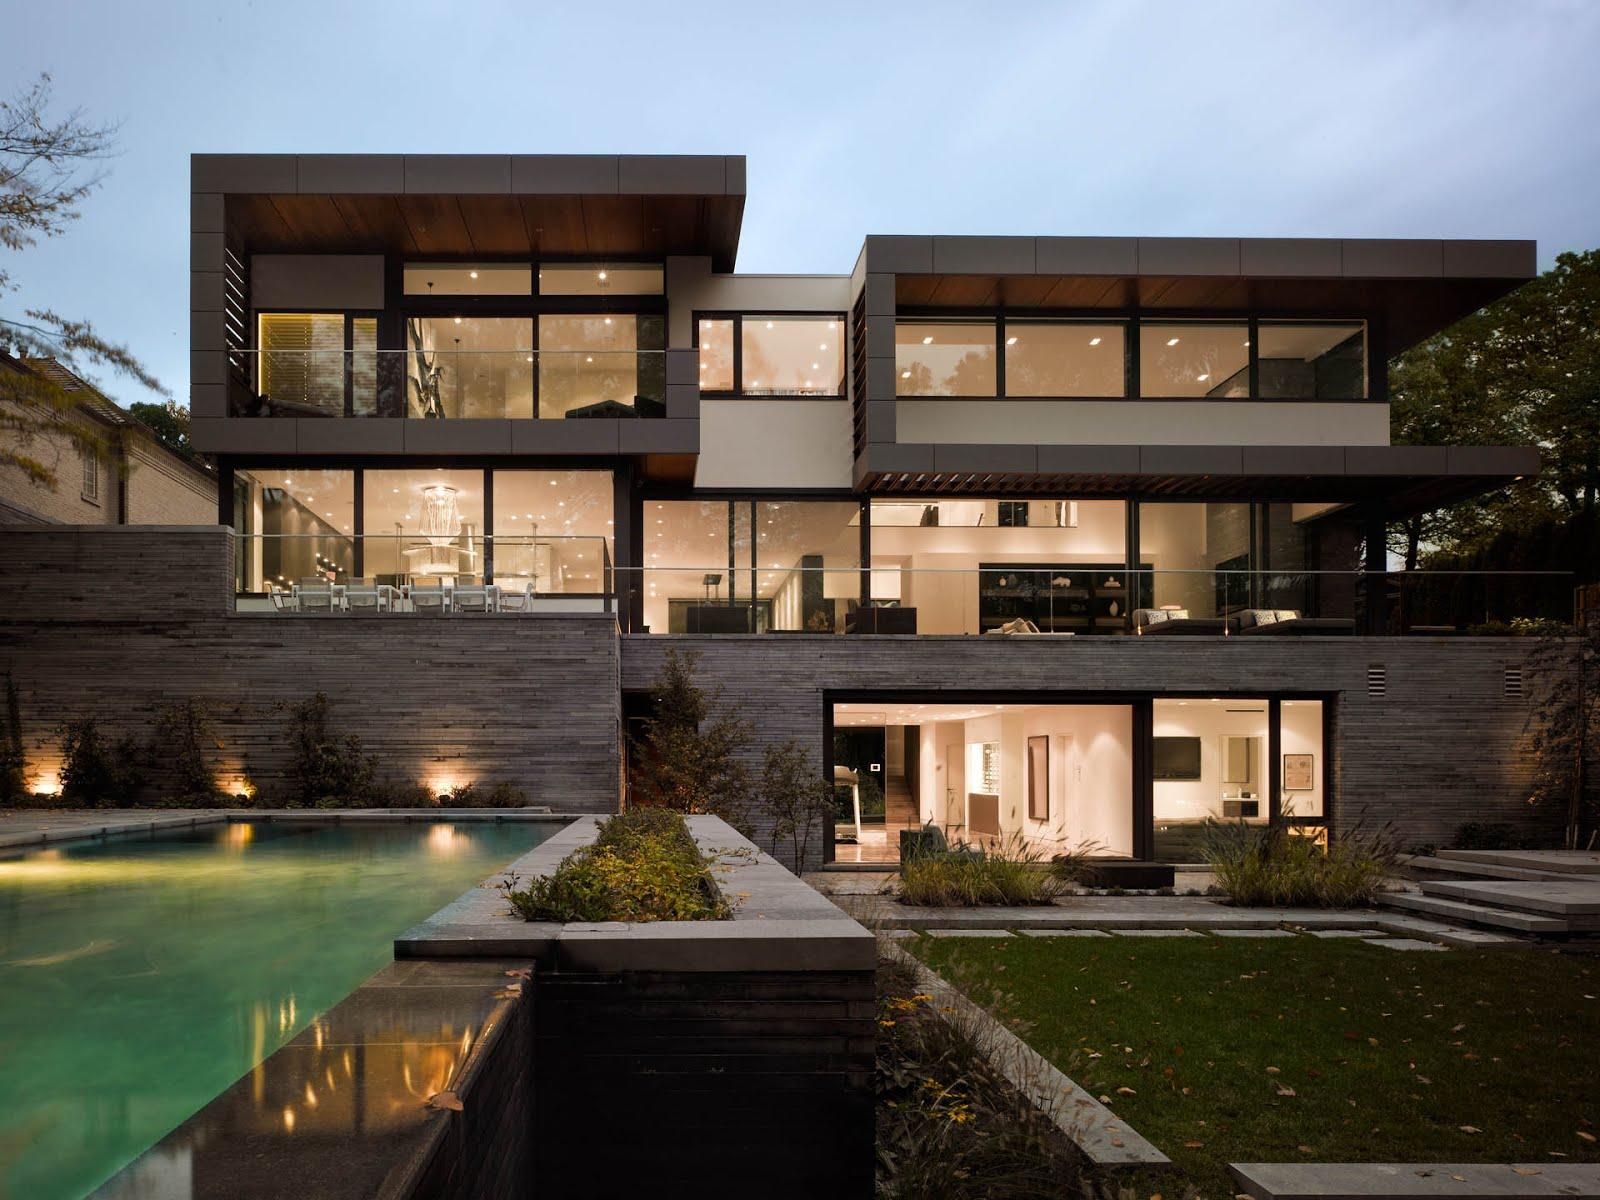 Bad Architecture Design Home on bad architecture design, bad nursing homes, bad architecture photography,